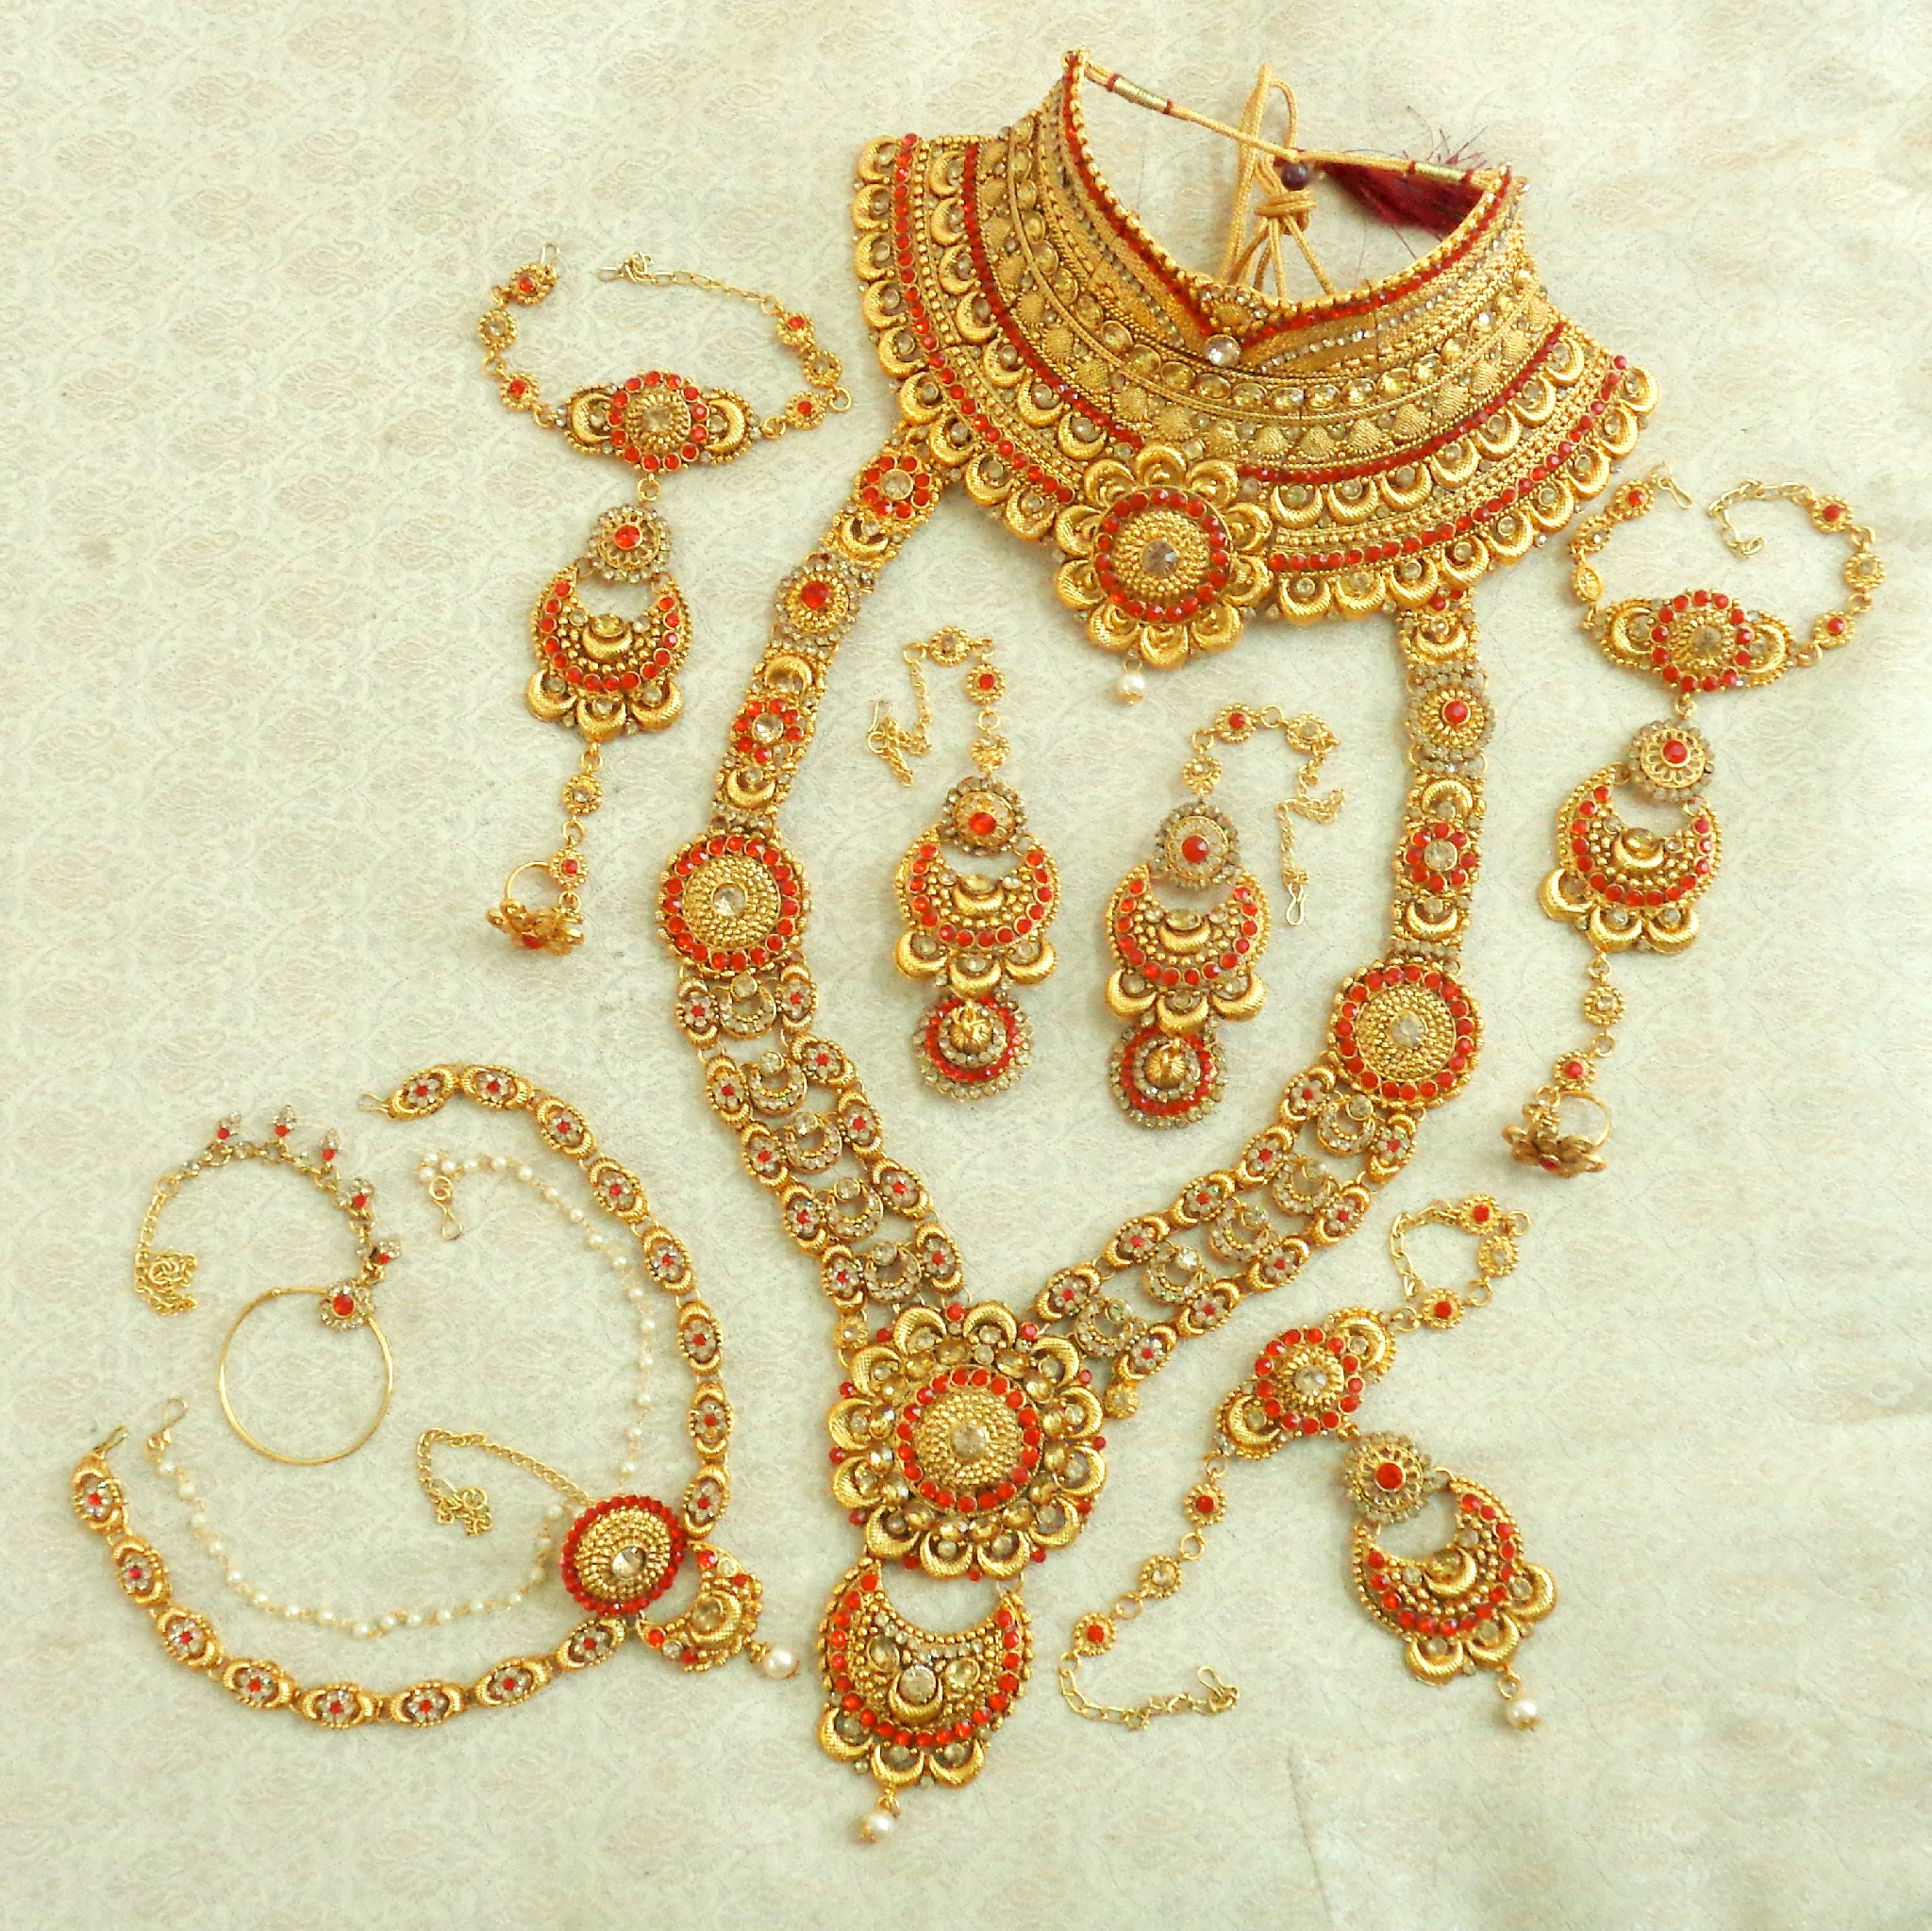 Lalso designer red golden full bridal dulhan wedding jewelry set - lsds06Rd